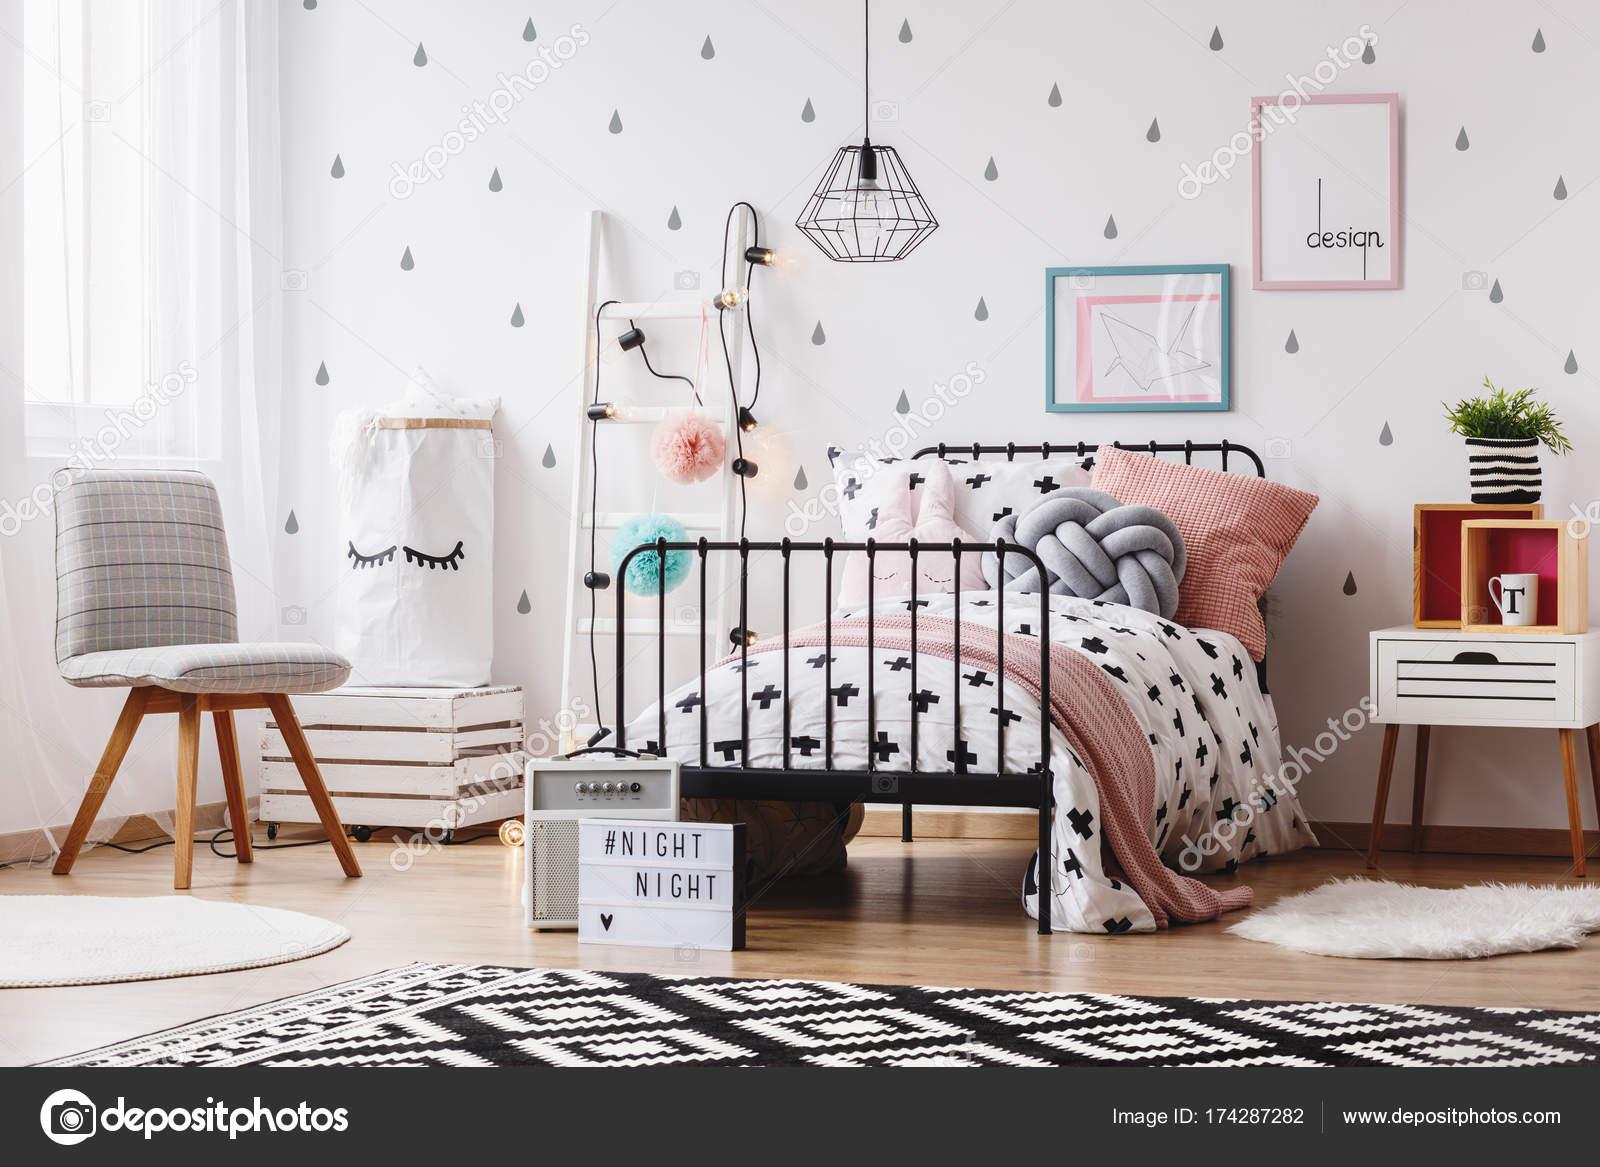 Roze Slaapkamer Stoel : Grijze stoel in slaapkamer van meisje u stockfoto photographee